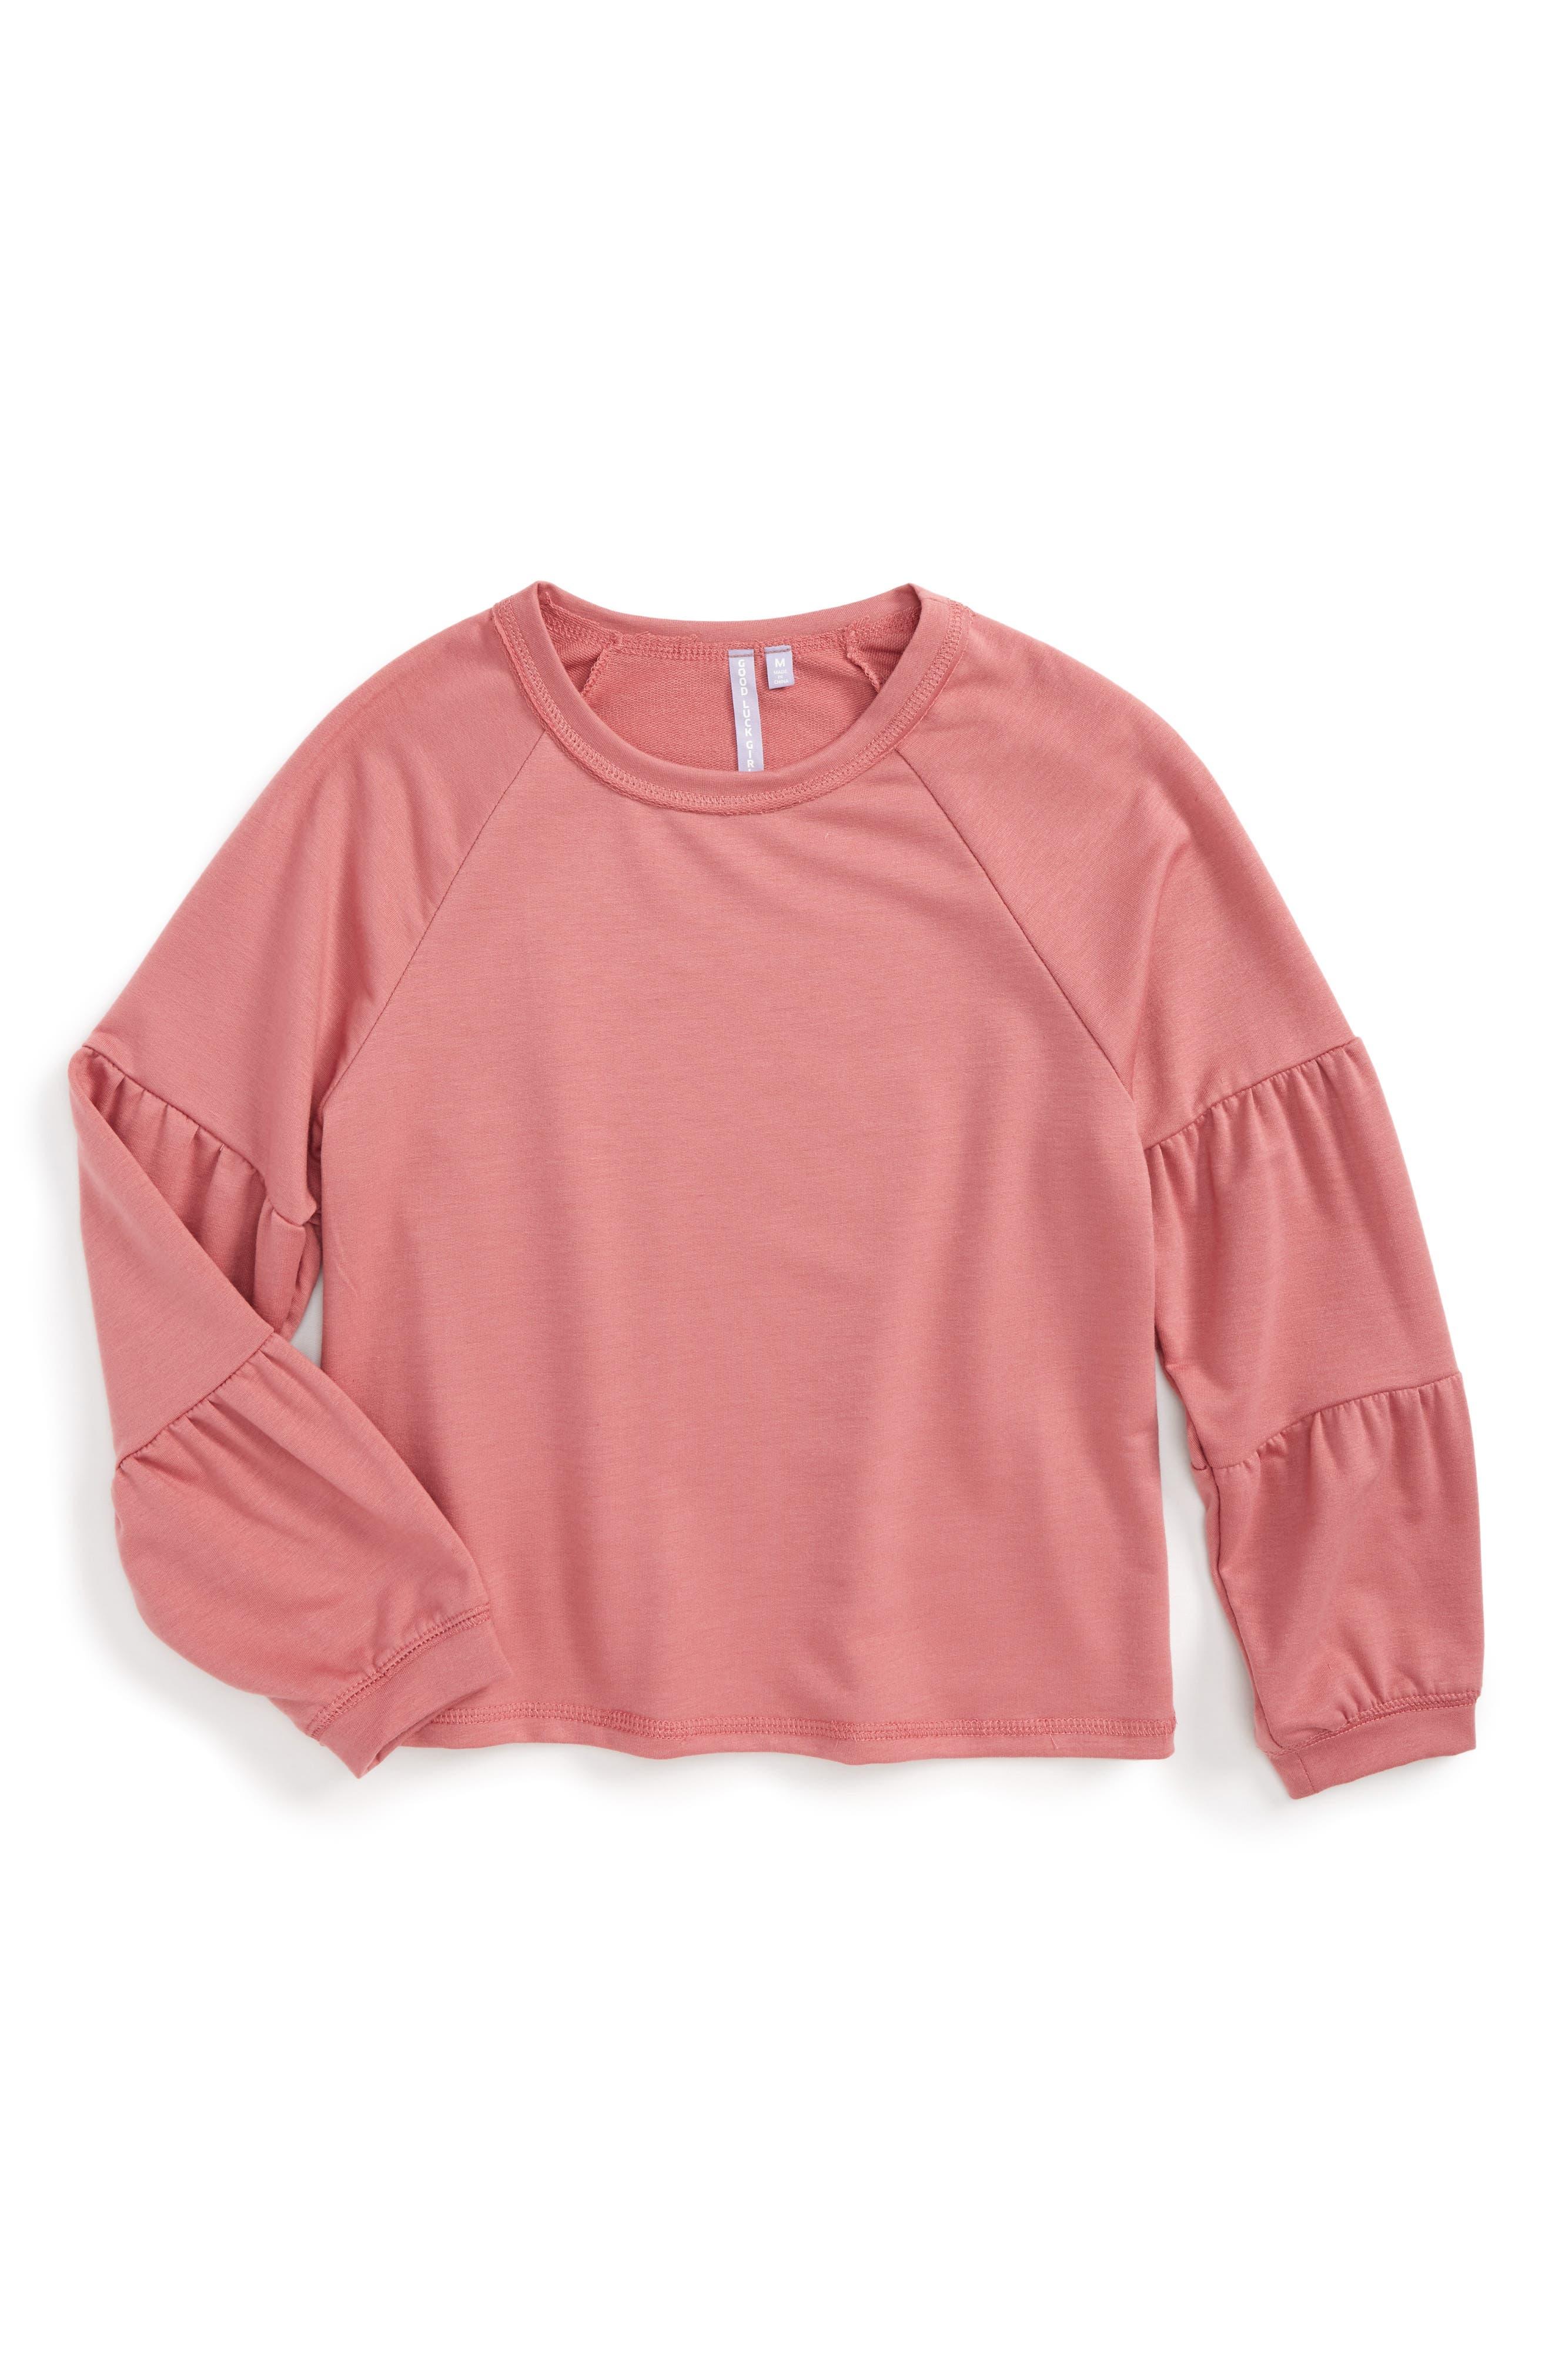 Main Image - Good Luck Gem Tiered Sleeve Sweatshirt (Big Girls)